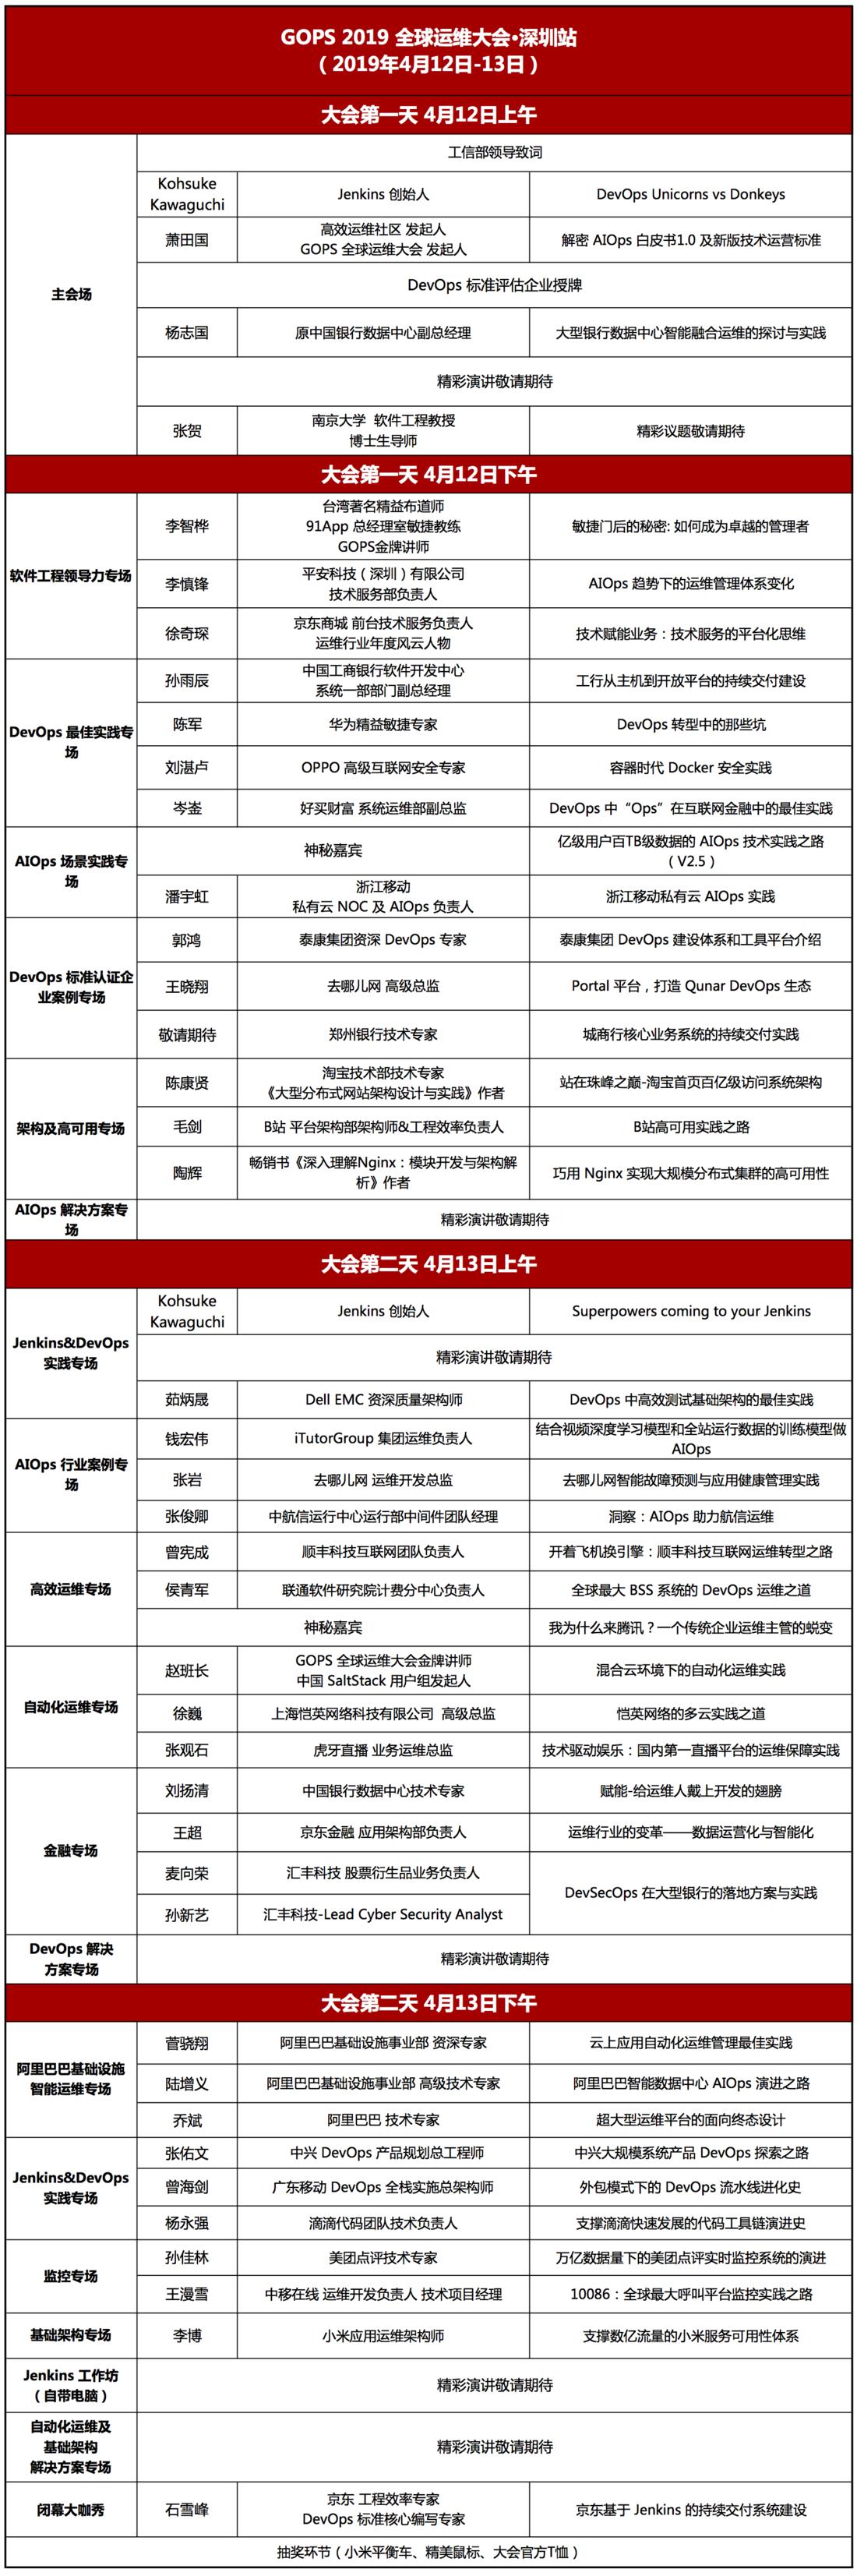 GOPS 19 深圳大会 2.21.png